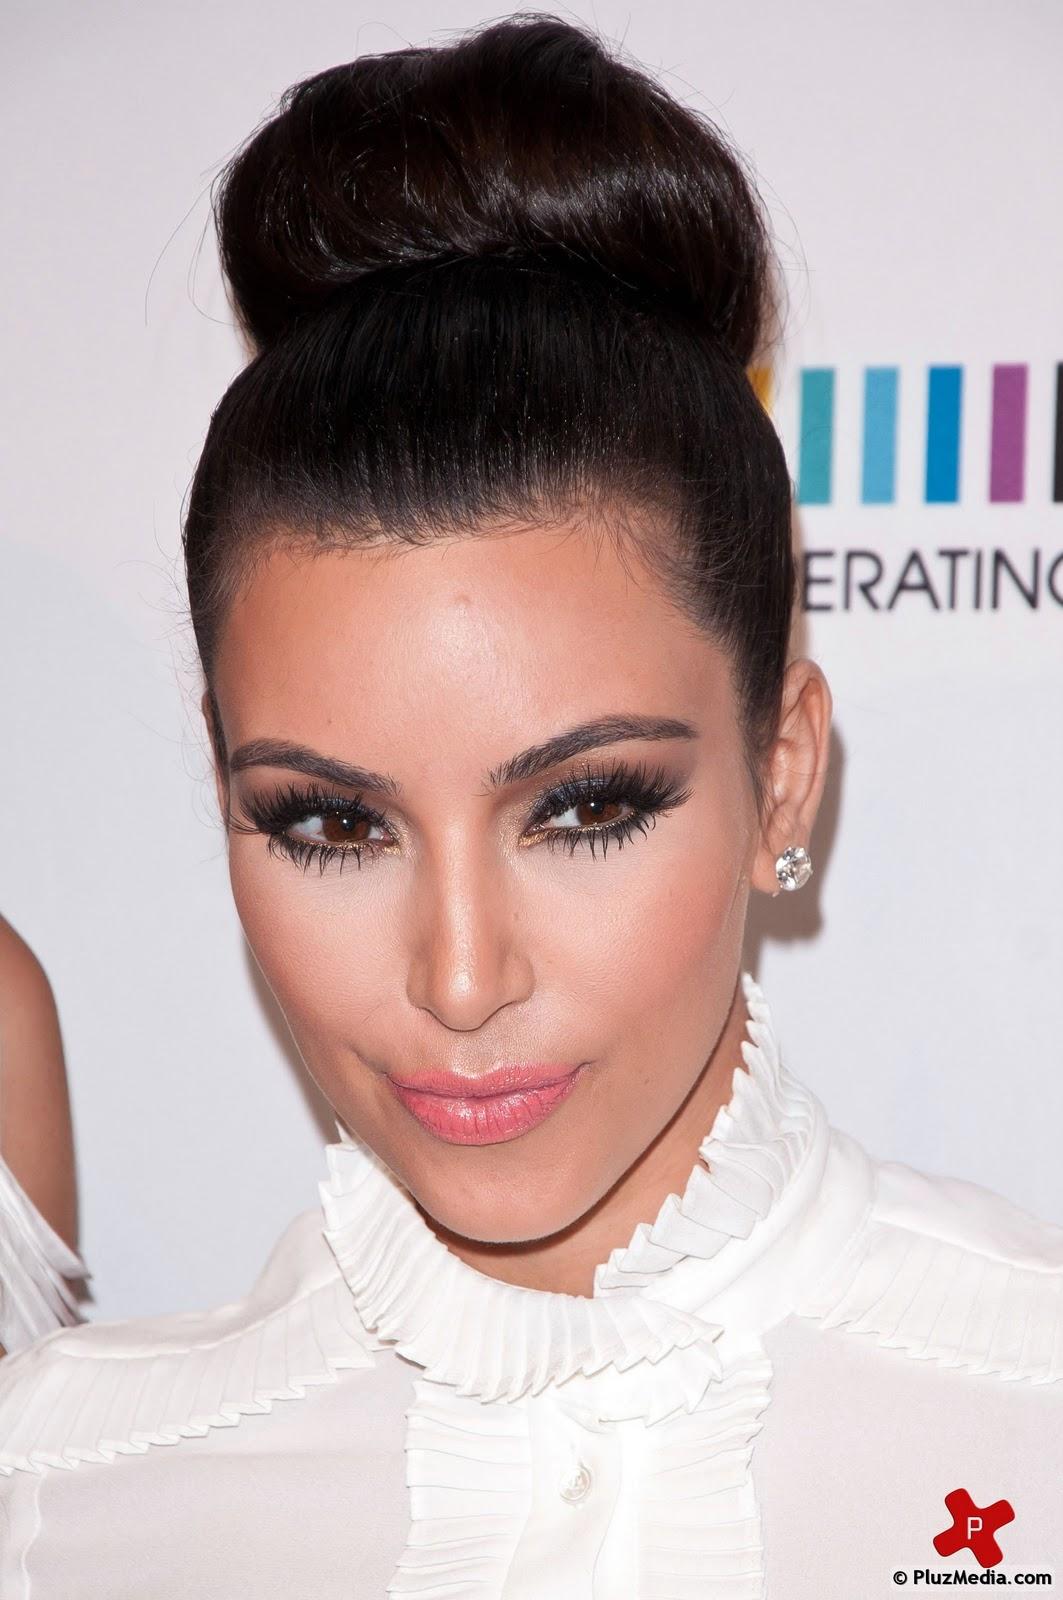 http://2.bp.blogspot.com/-dQGIKW4HlC8/TrkXZXzsINI/AAAAAAAADAI/HNW4q7eTVzw/s1600/big_Kim_Kardashian_felt_like_Cleopatra_in_one_shouldered_gown_red_lipstick-029a3dbb06fdf12345caf4c29a021528.jpg